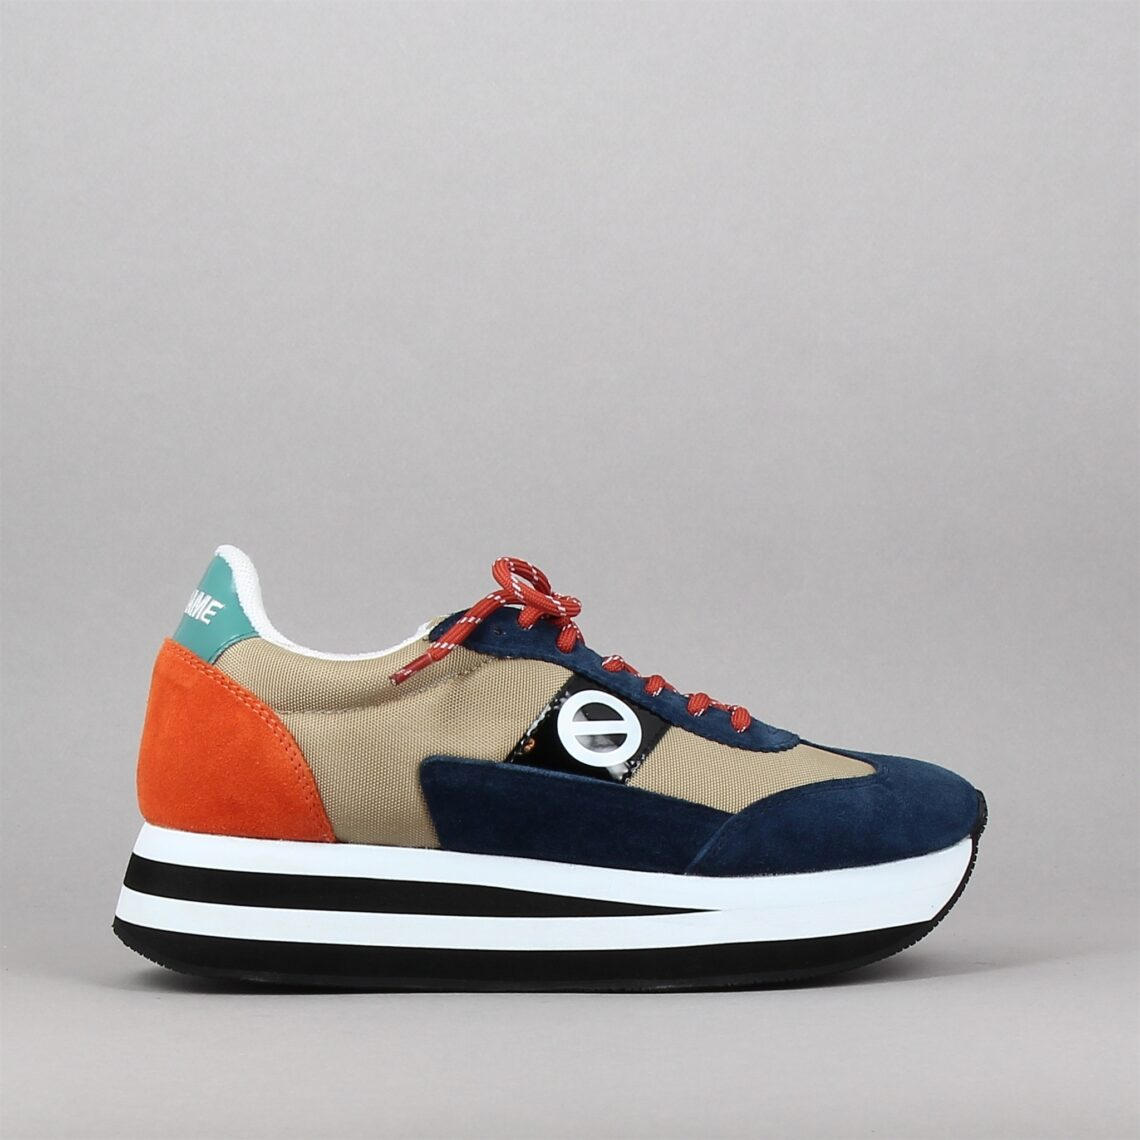 flex-jogger-19-bleu-marine-171442178-0.jpg